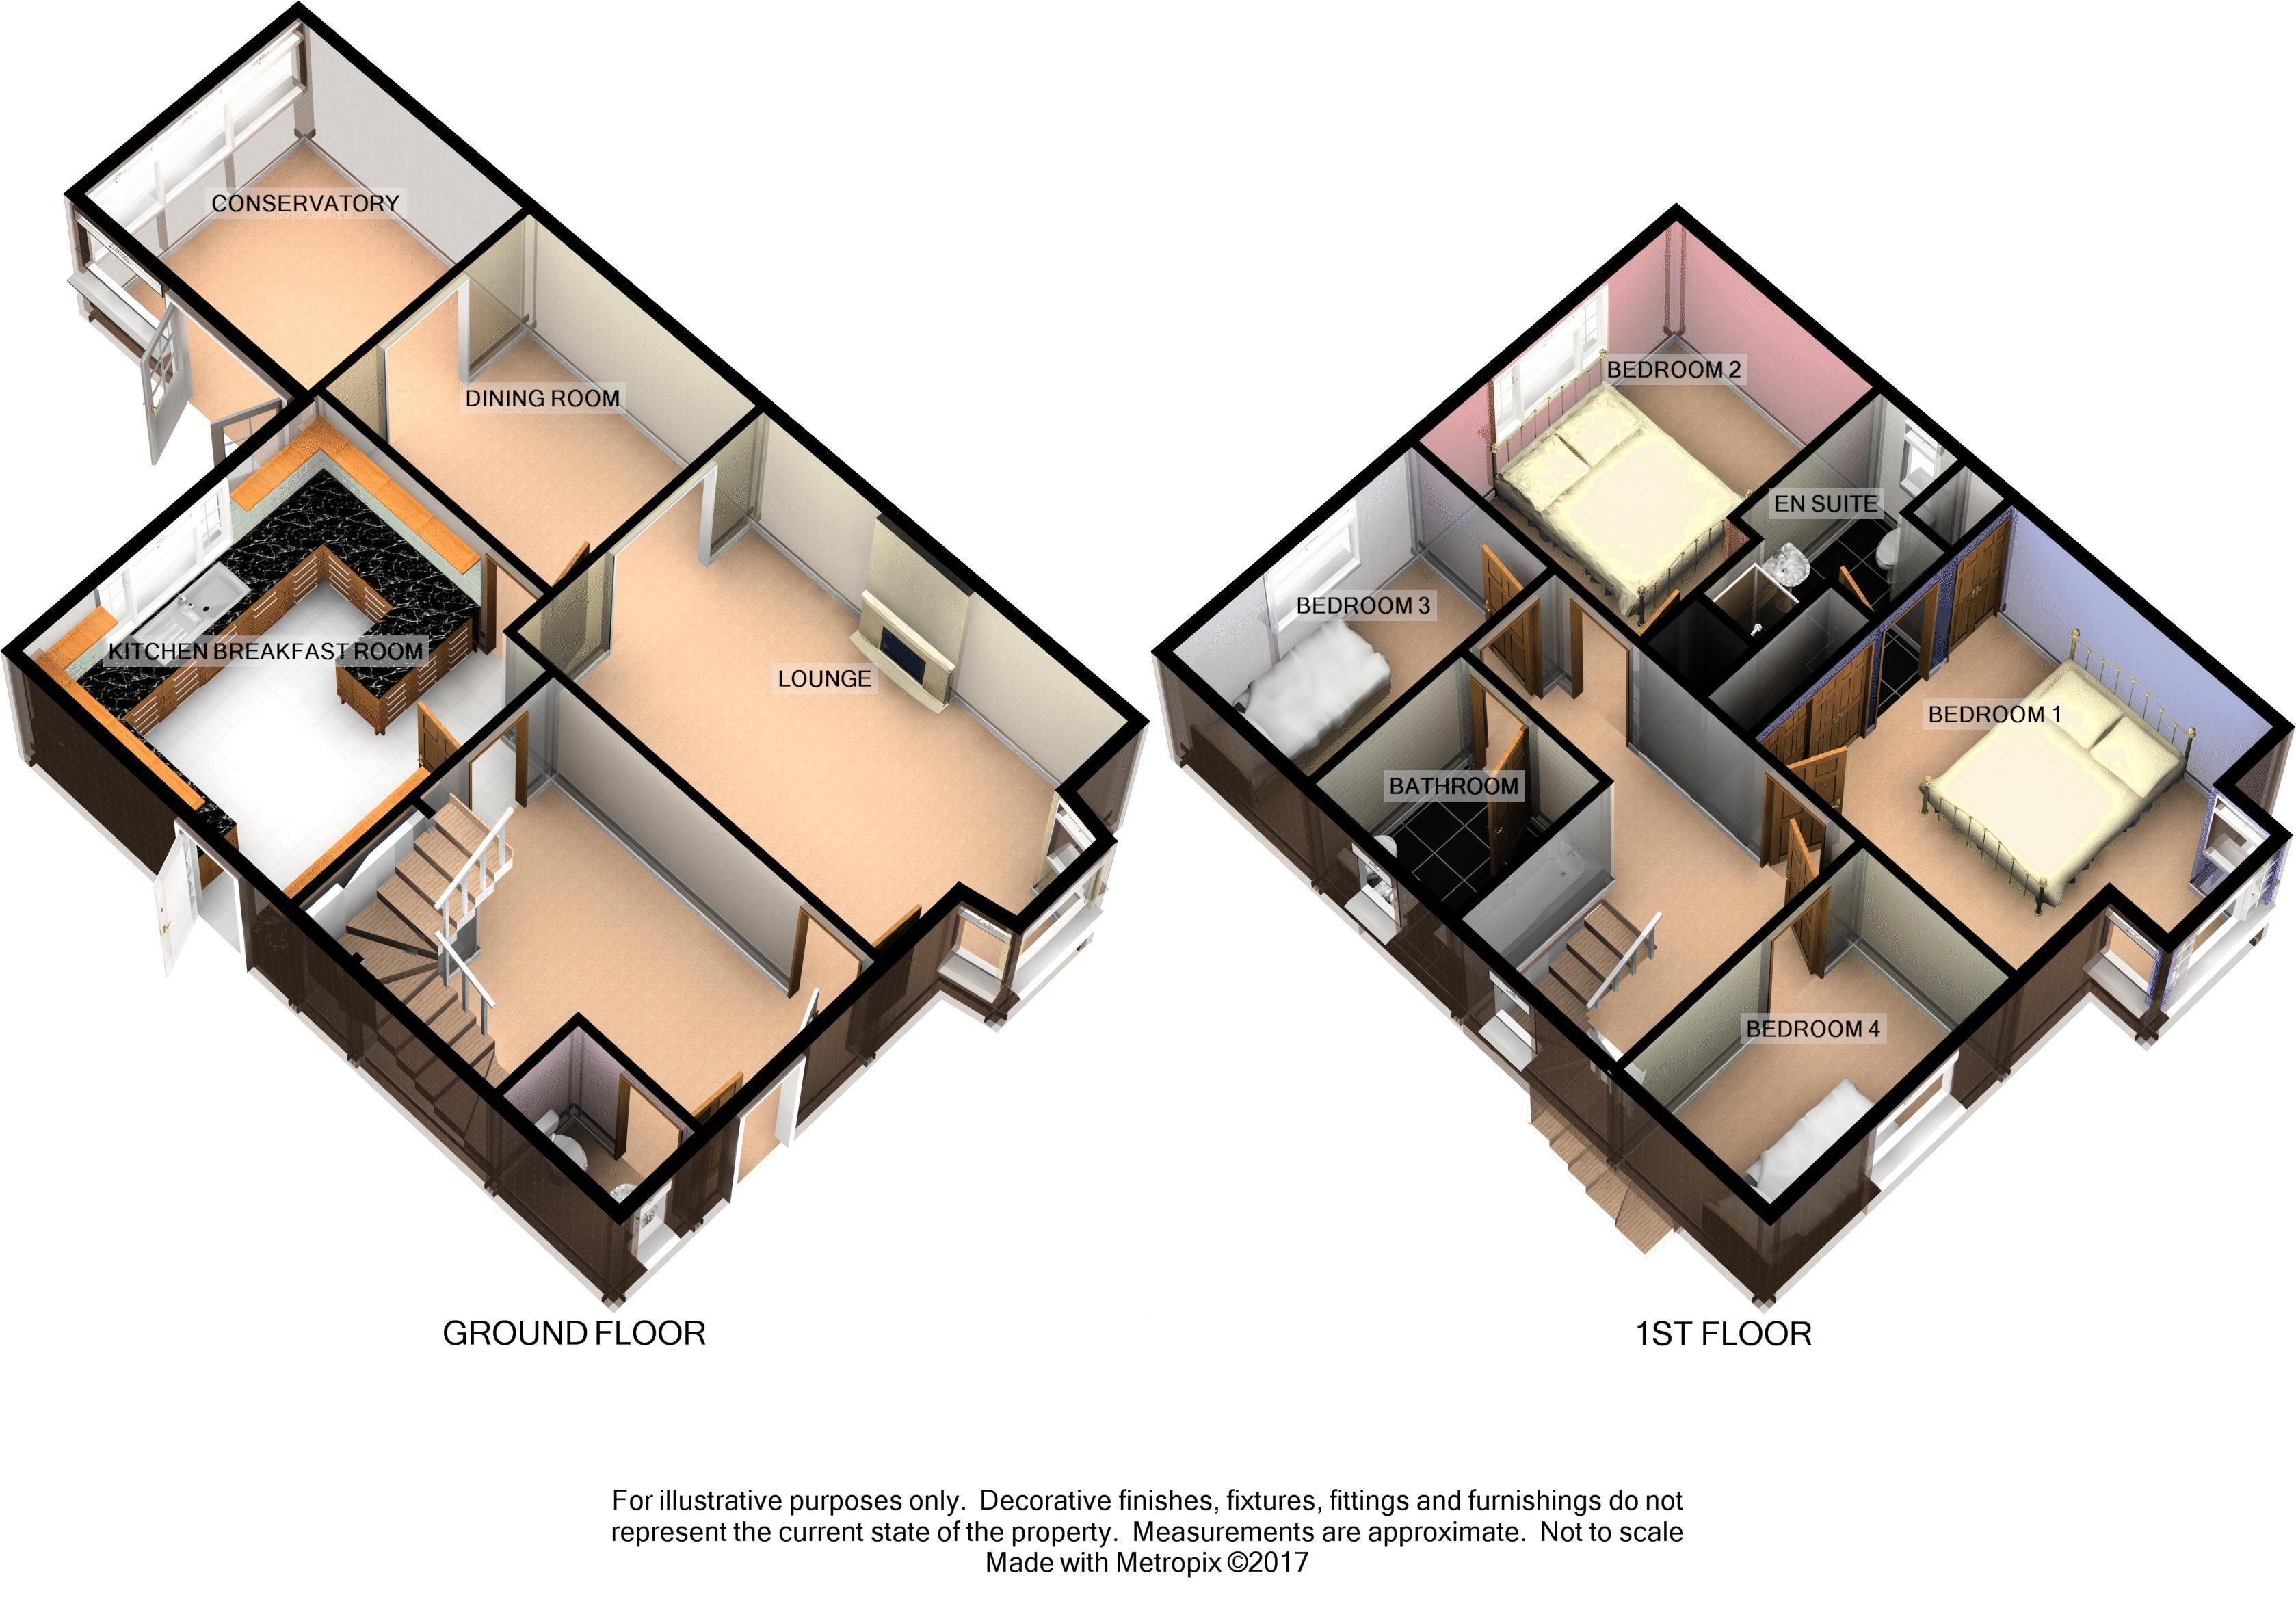 Etonhurst Close, Exeter floorplan